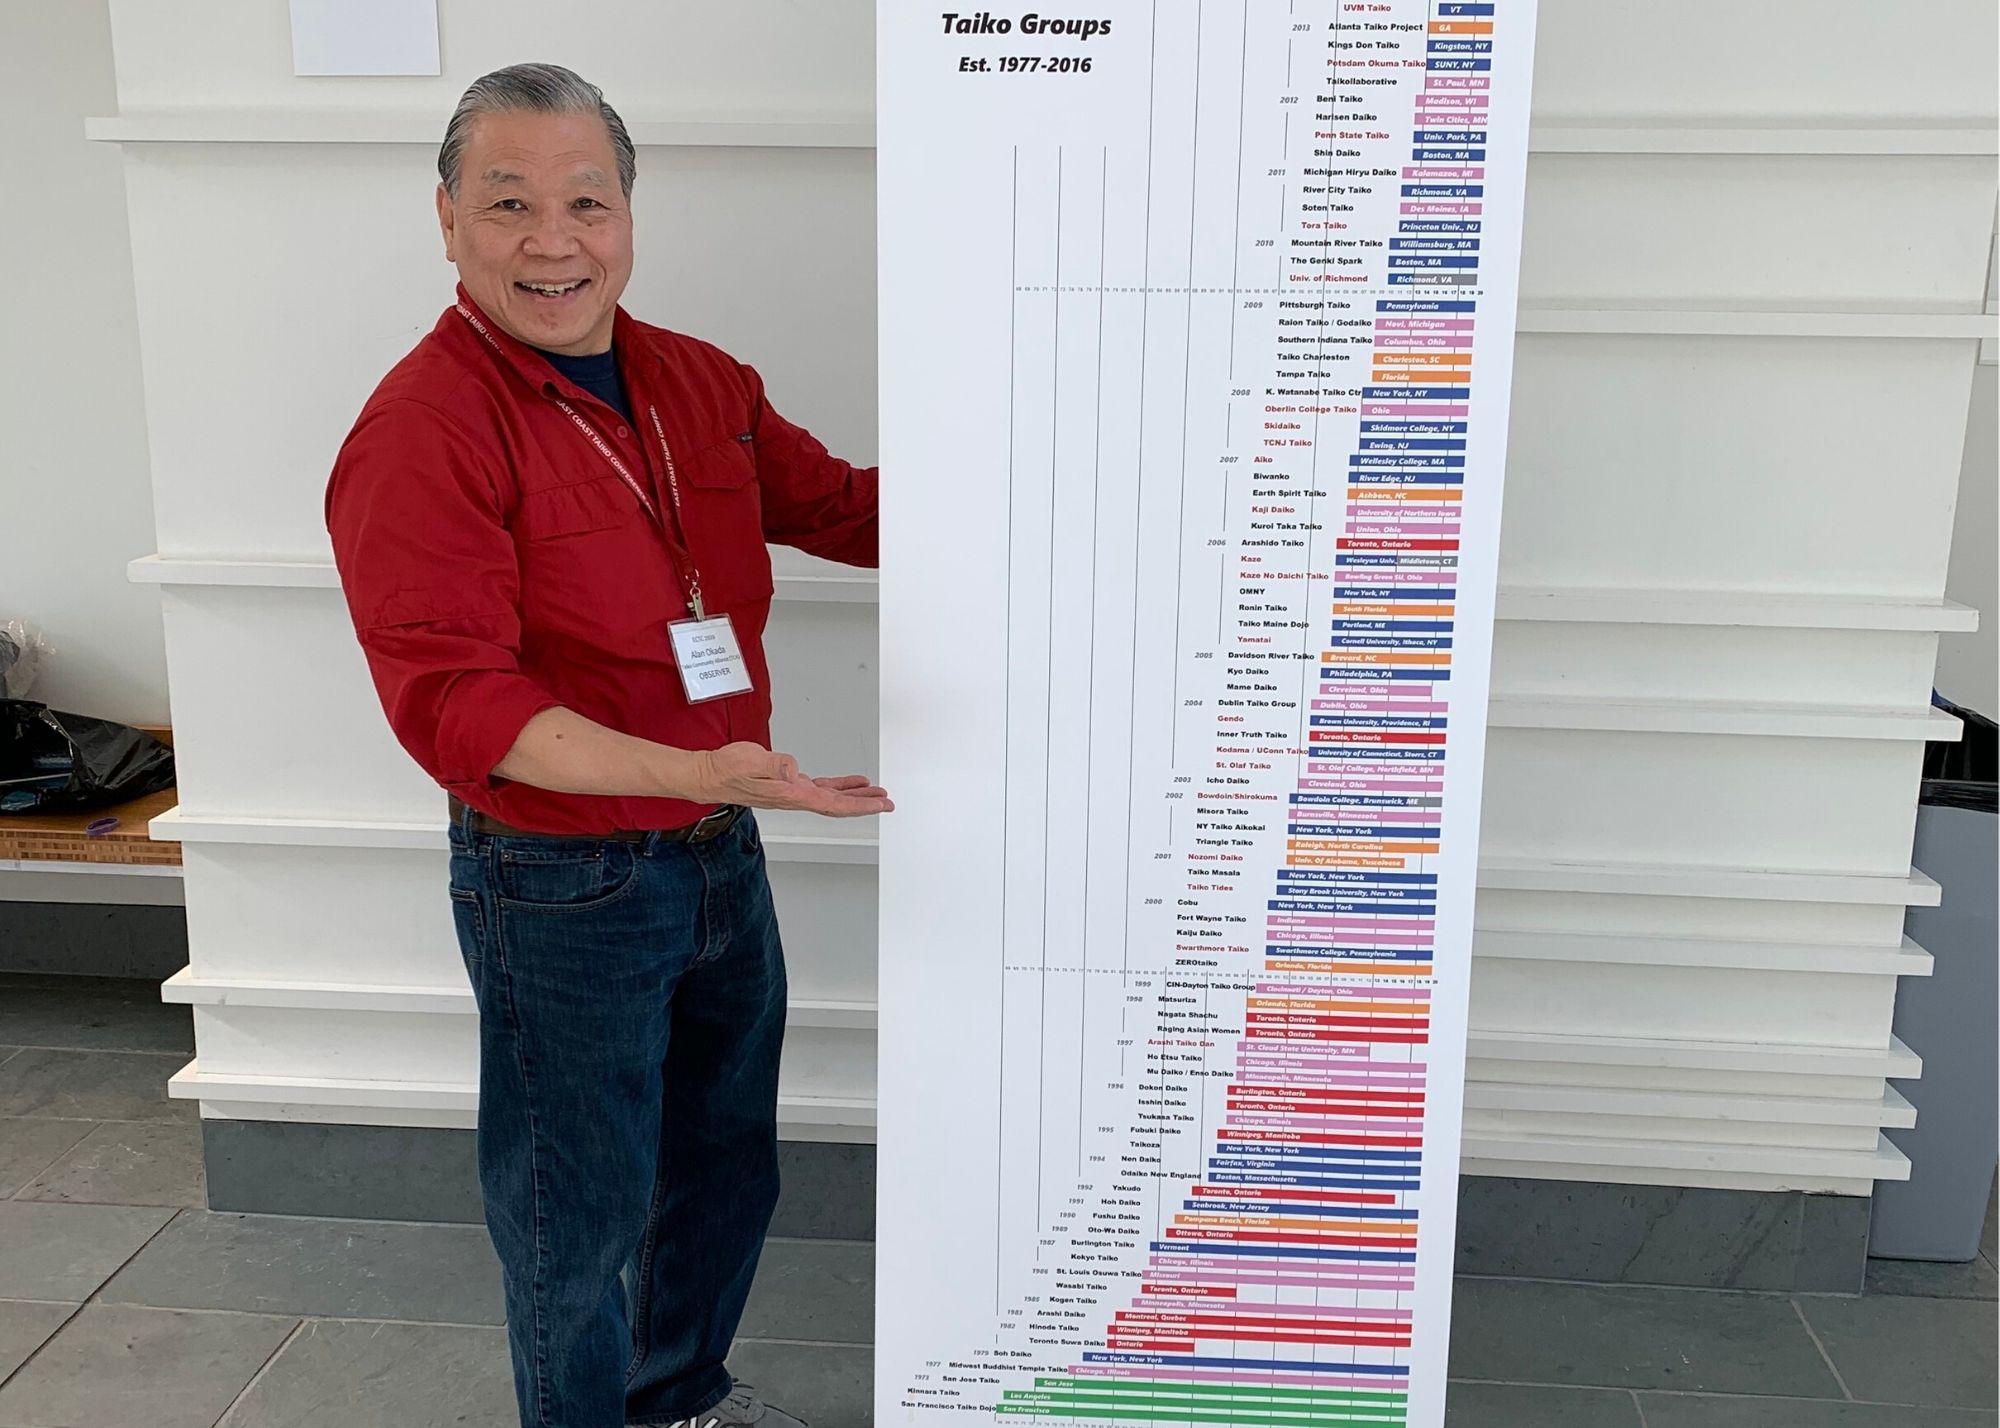 Founding member Alan Okada with his East Coast taiko group timeline